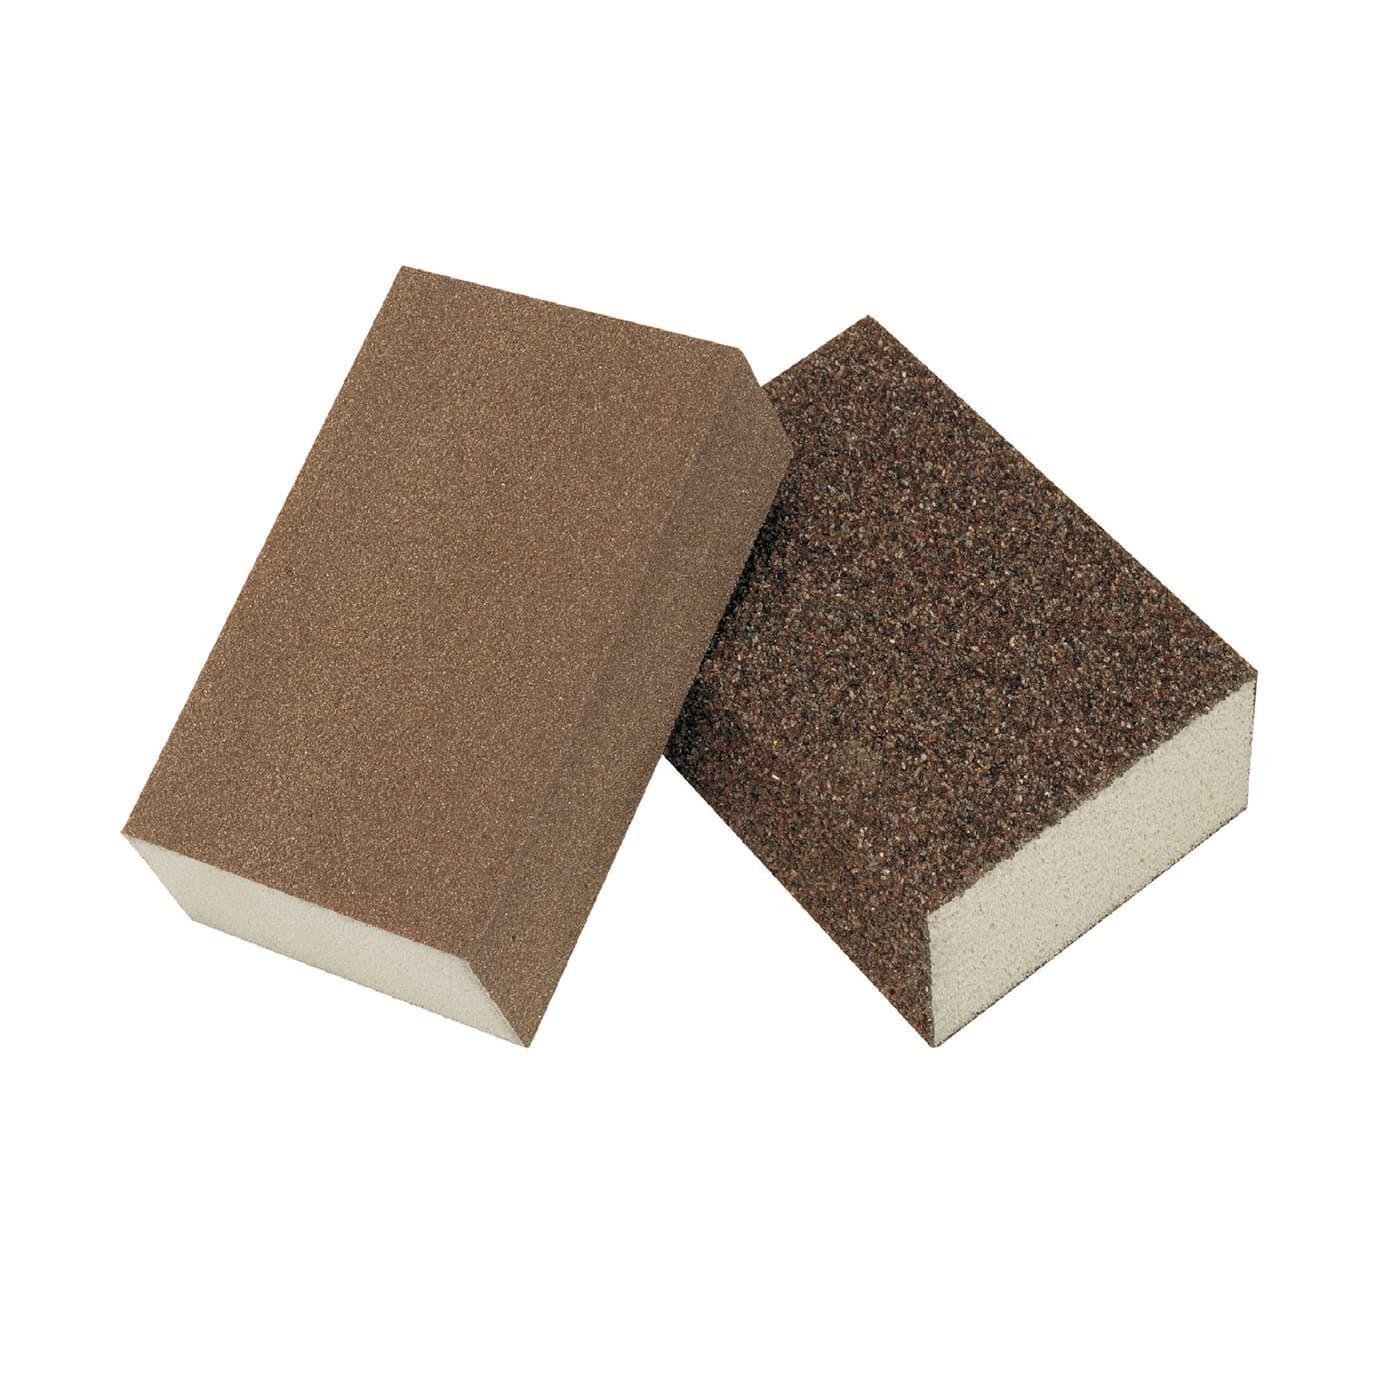 920 Sanding sponges (4×4)